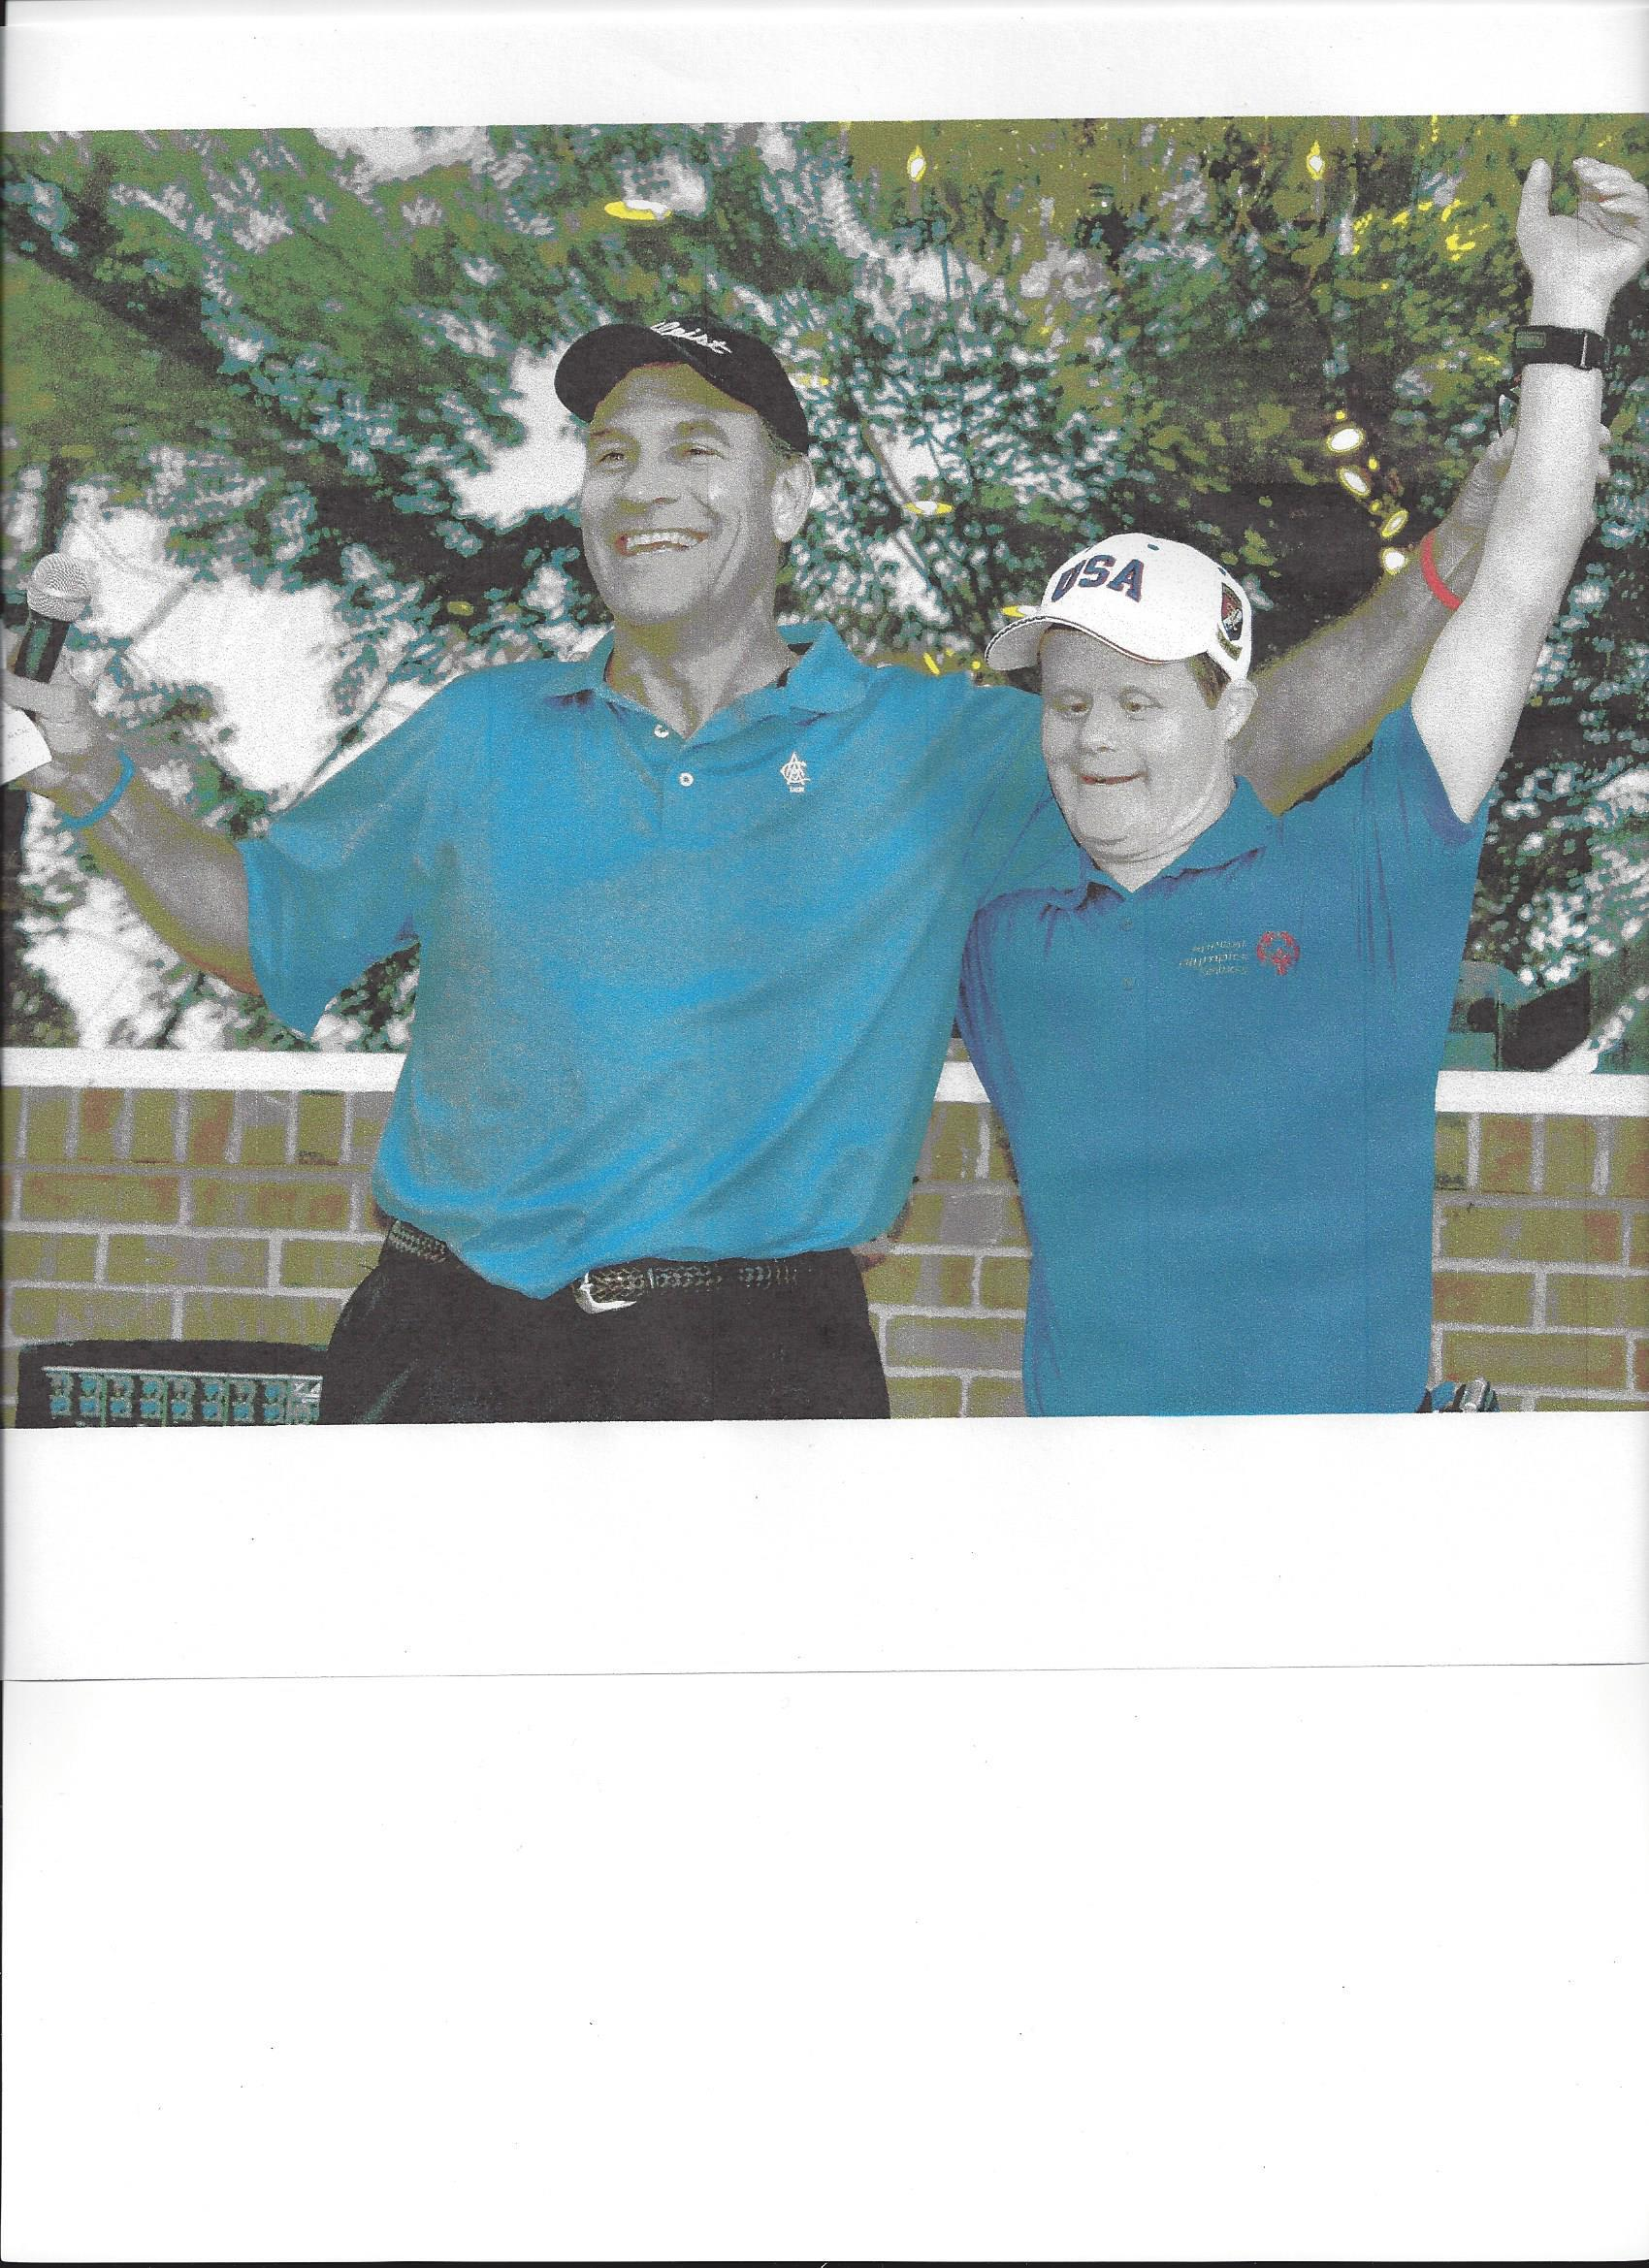 KENTUCKY WIRELESS GOLF-Benefiting the Special Olympics of Kentucky